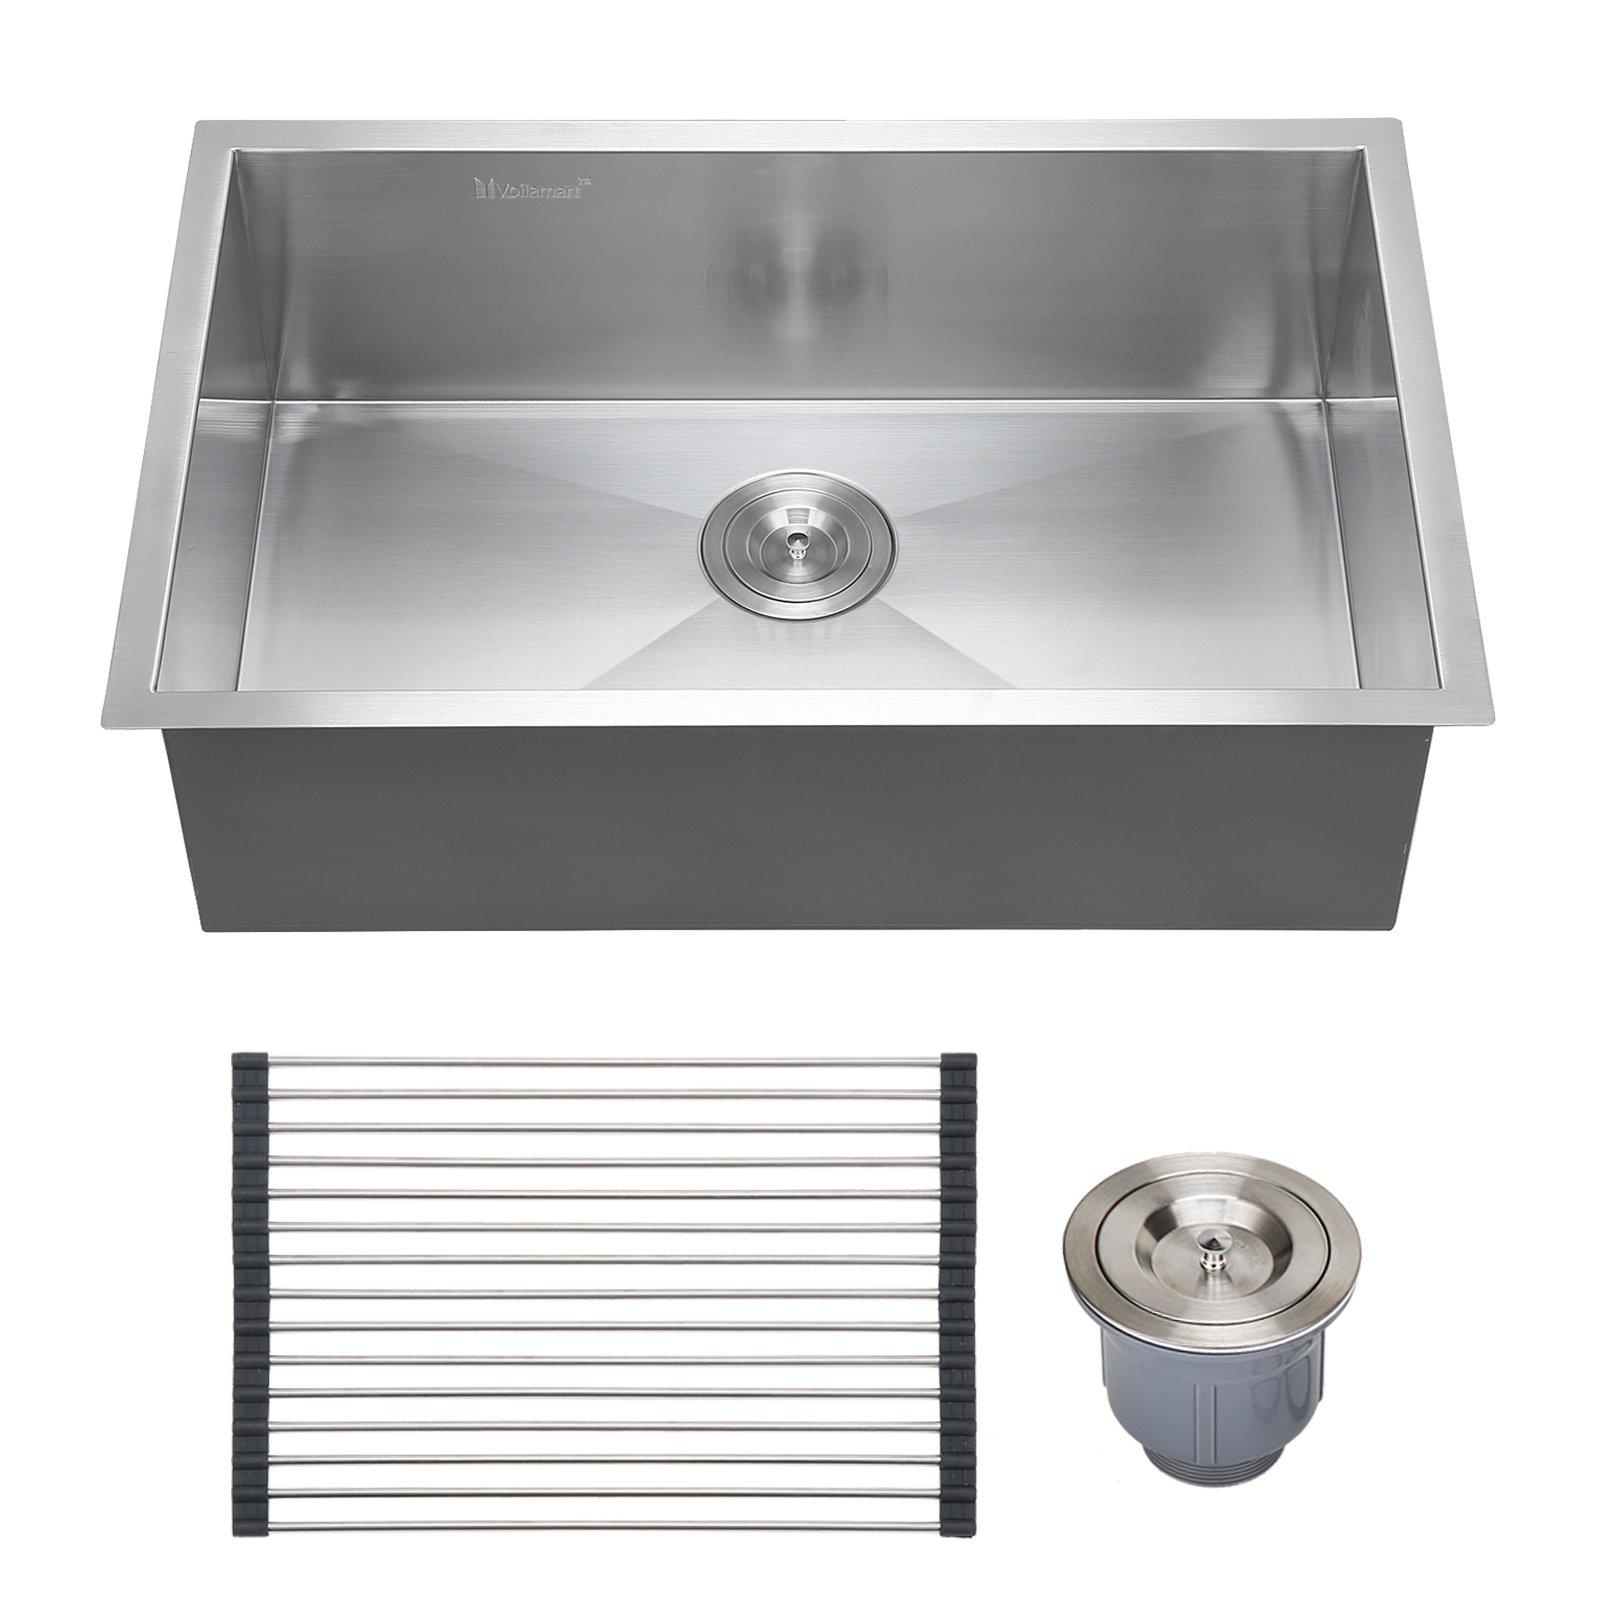 Voilamart 28'' x 18'' Single Bowl Handmade Stainless Steel Kitchen Sink 18 Gauge - Undermount Topmount Flushmount